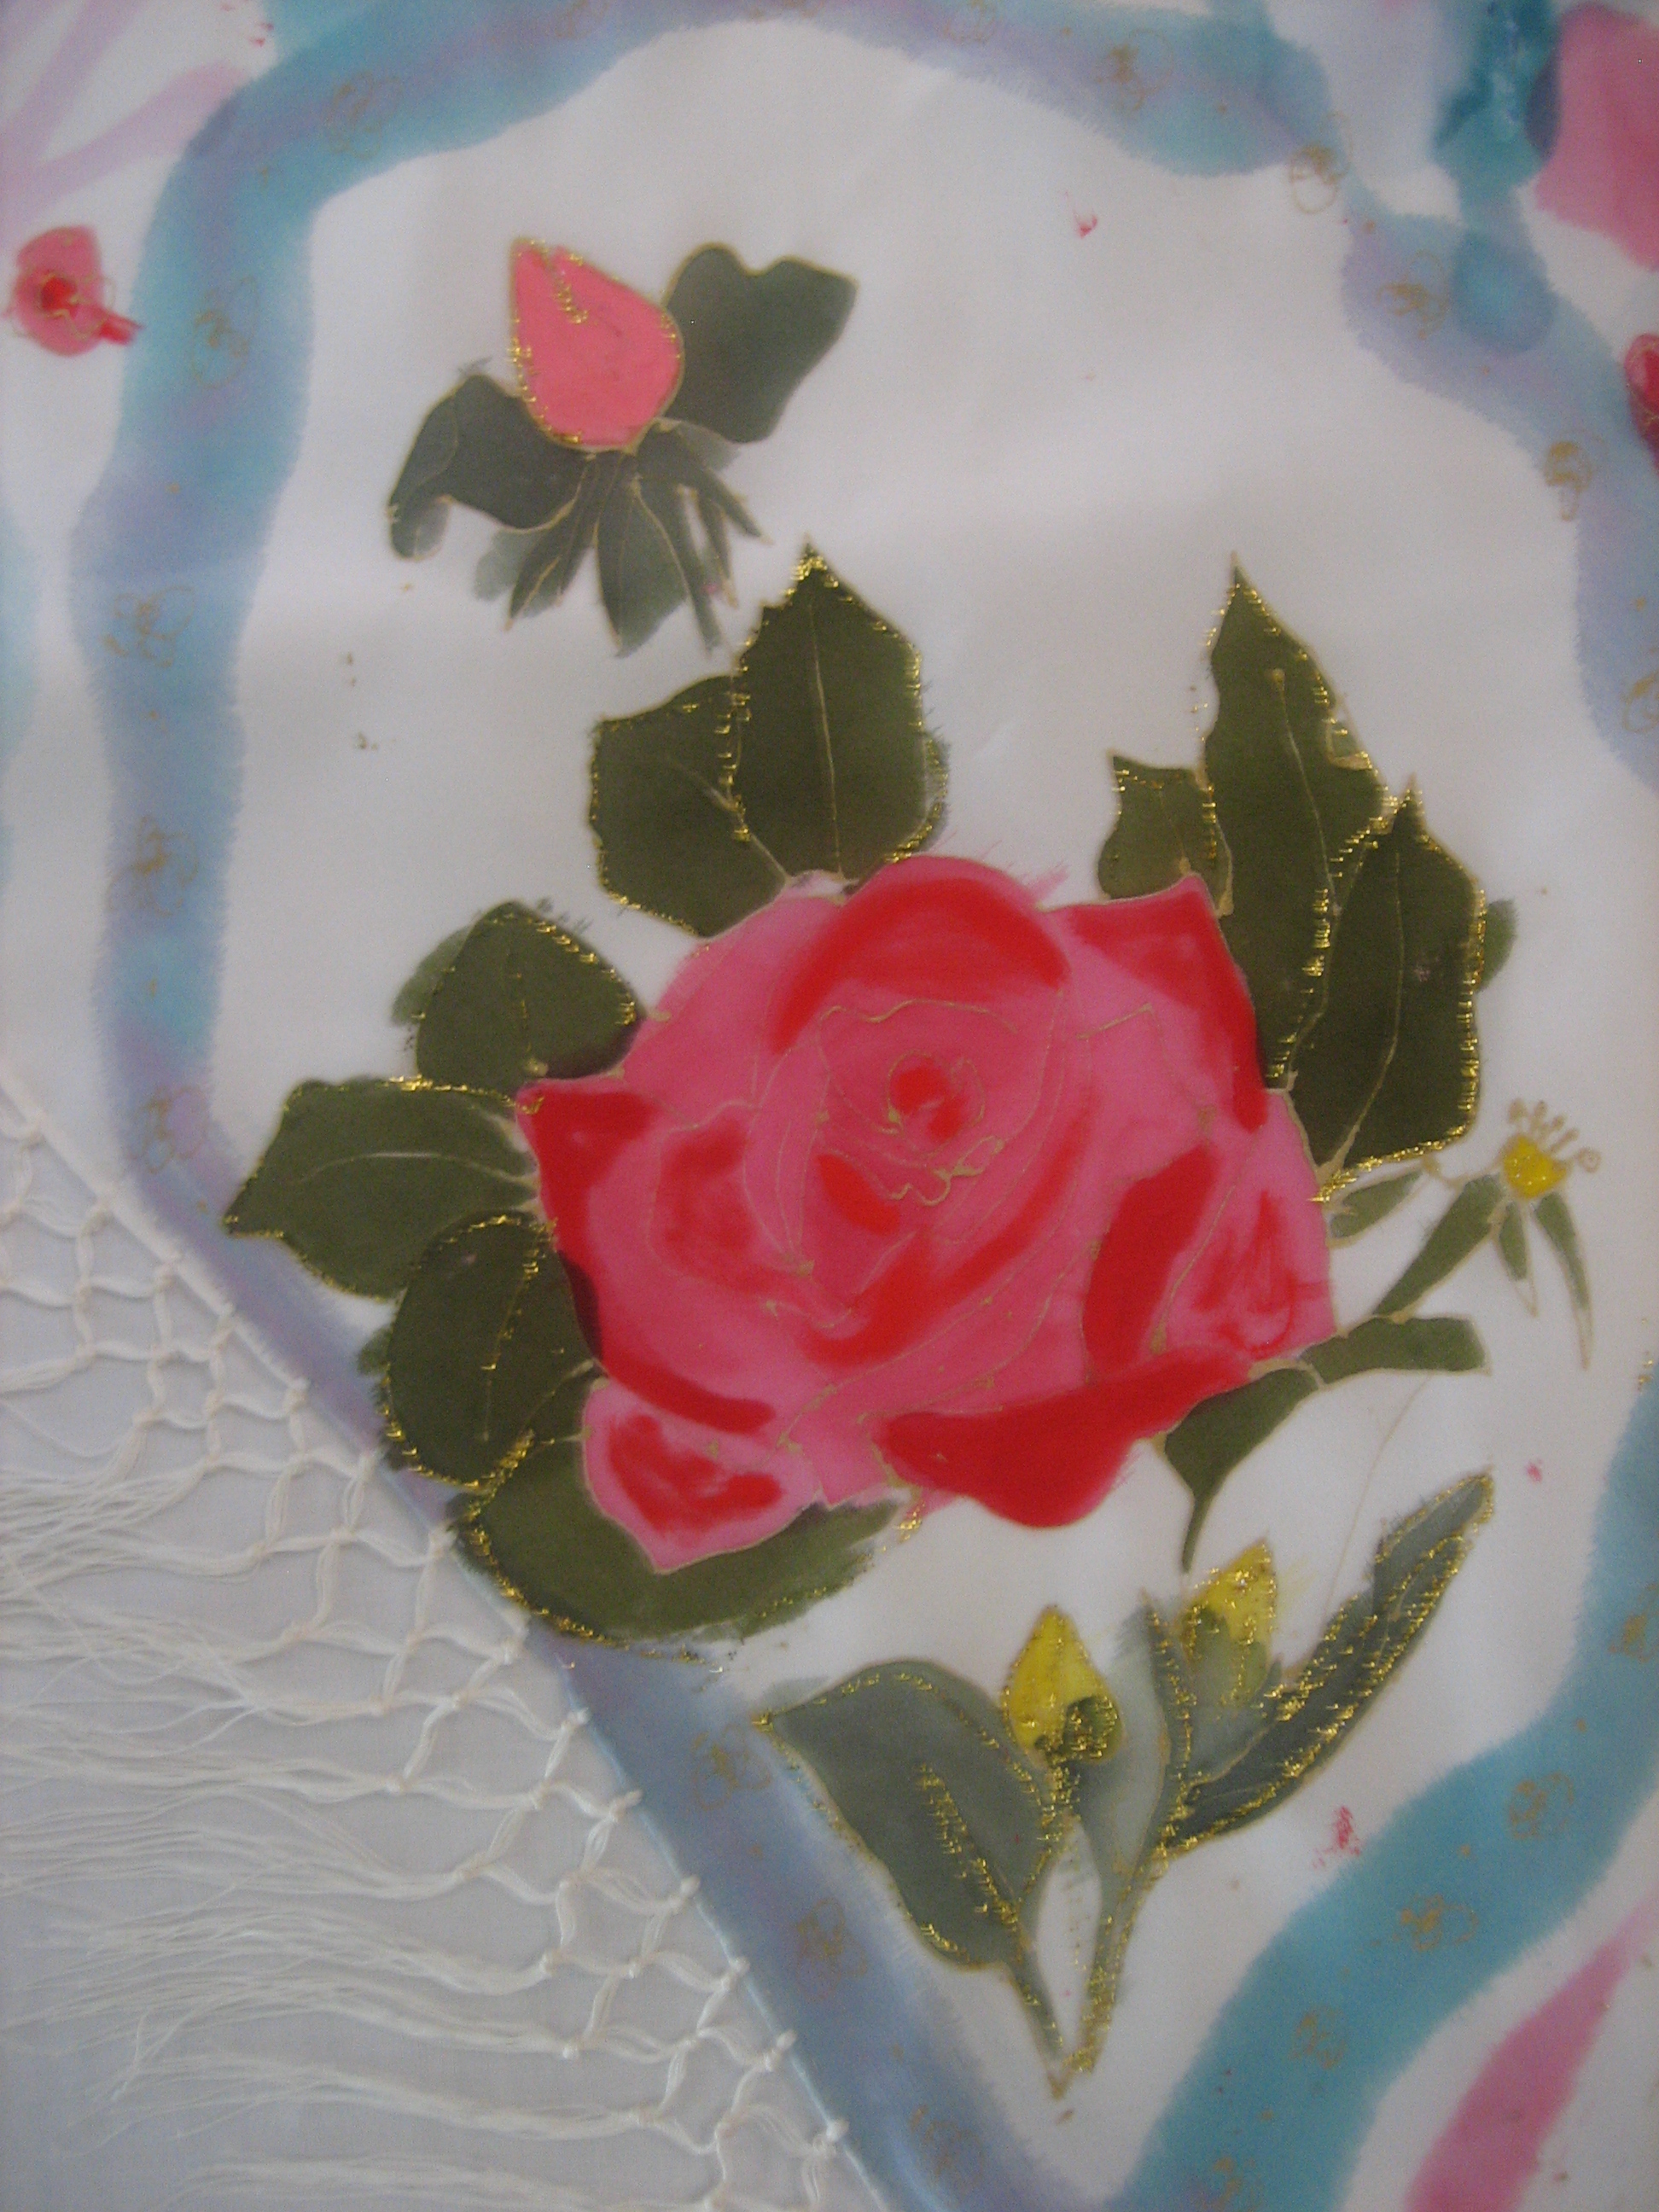 Detalle de la rosa roja pintada en sed crepe de chine